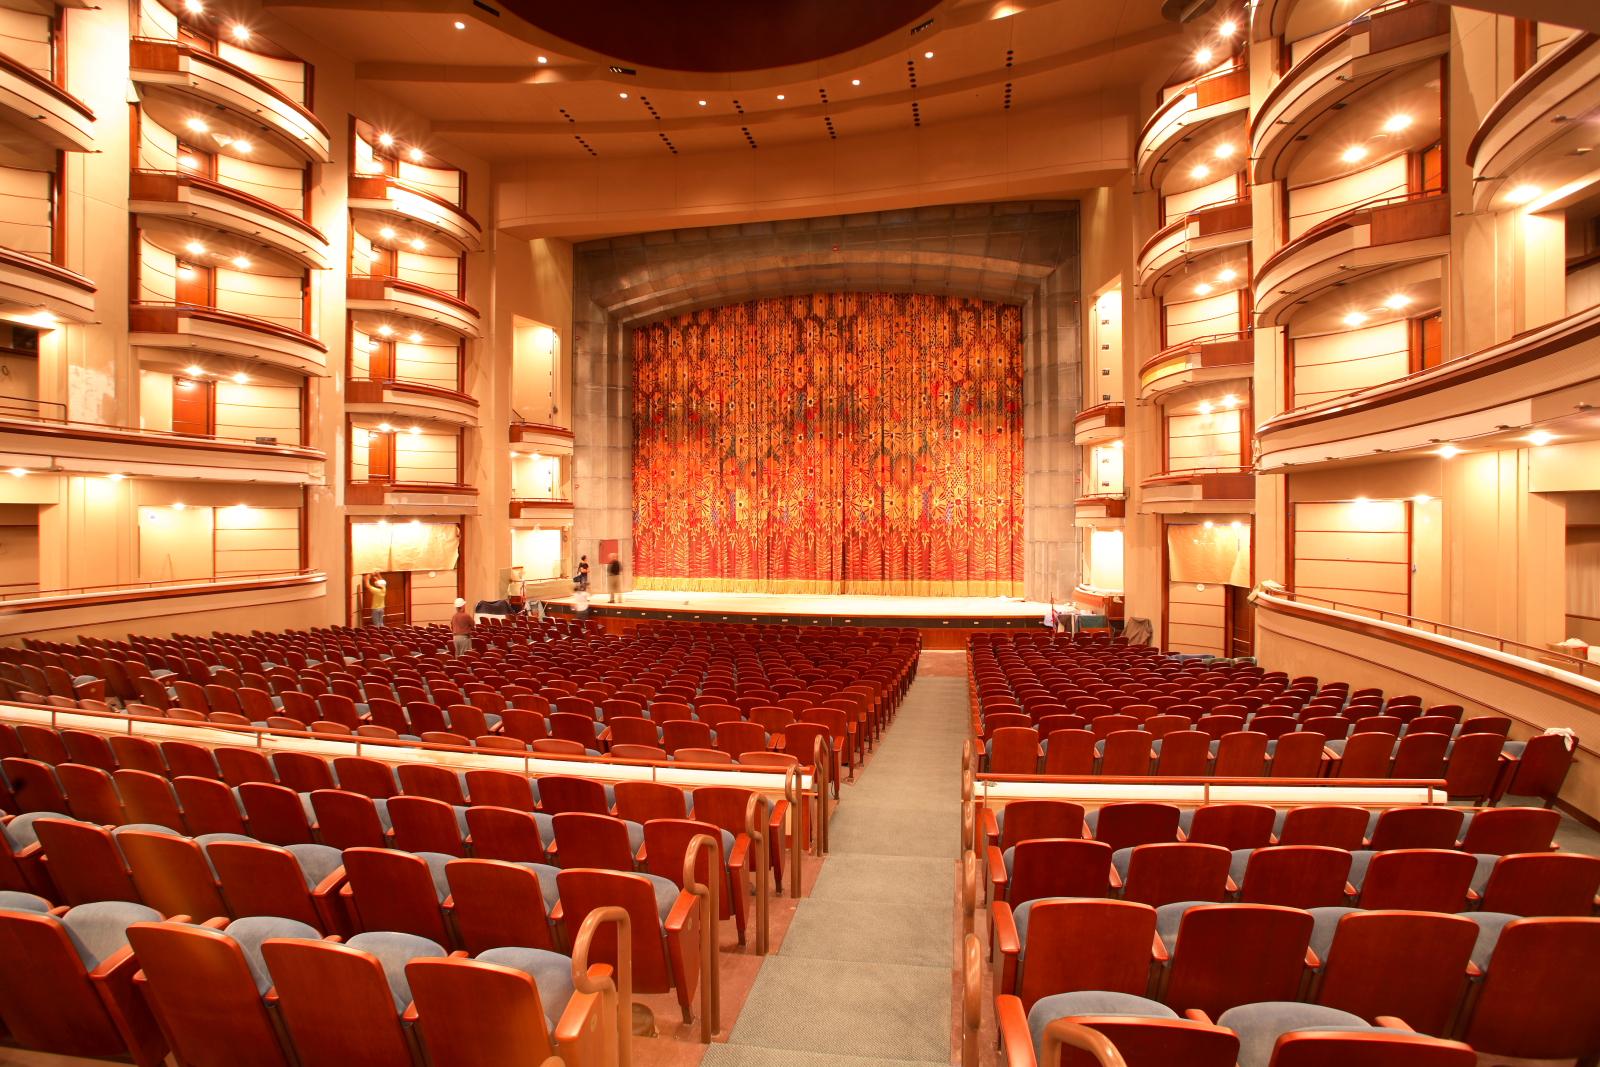 Proscenium stage. | Comedy of Errors: Technical Design Project ...